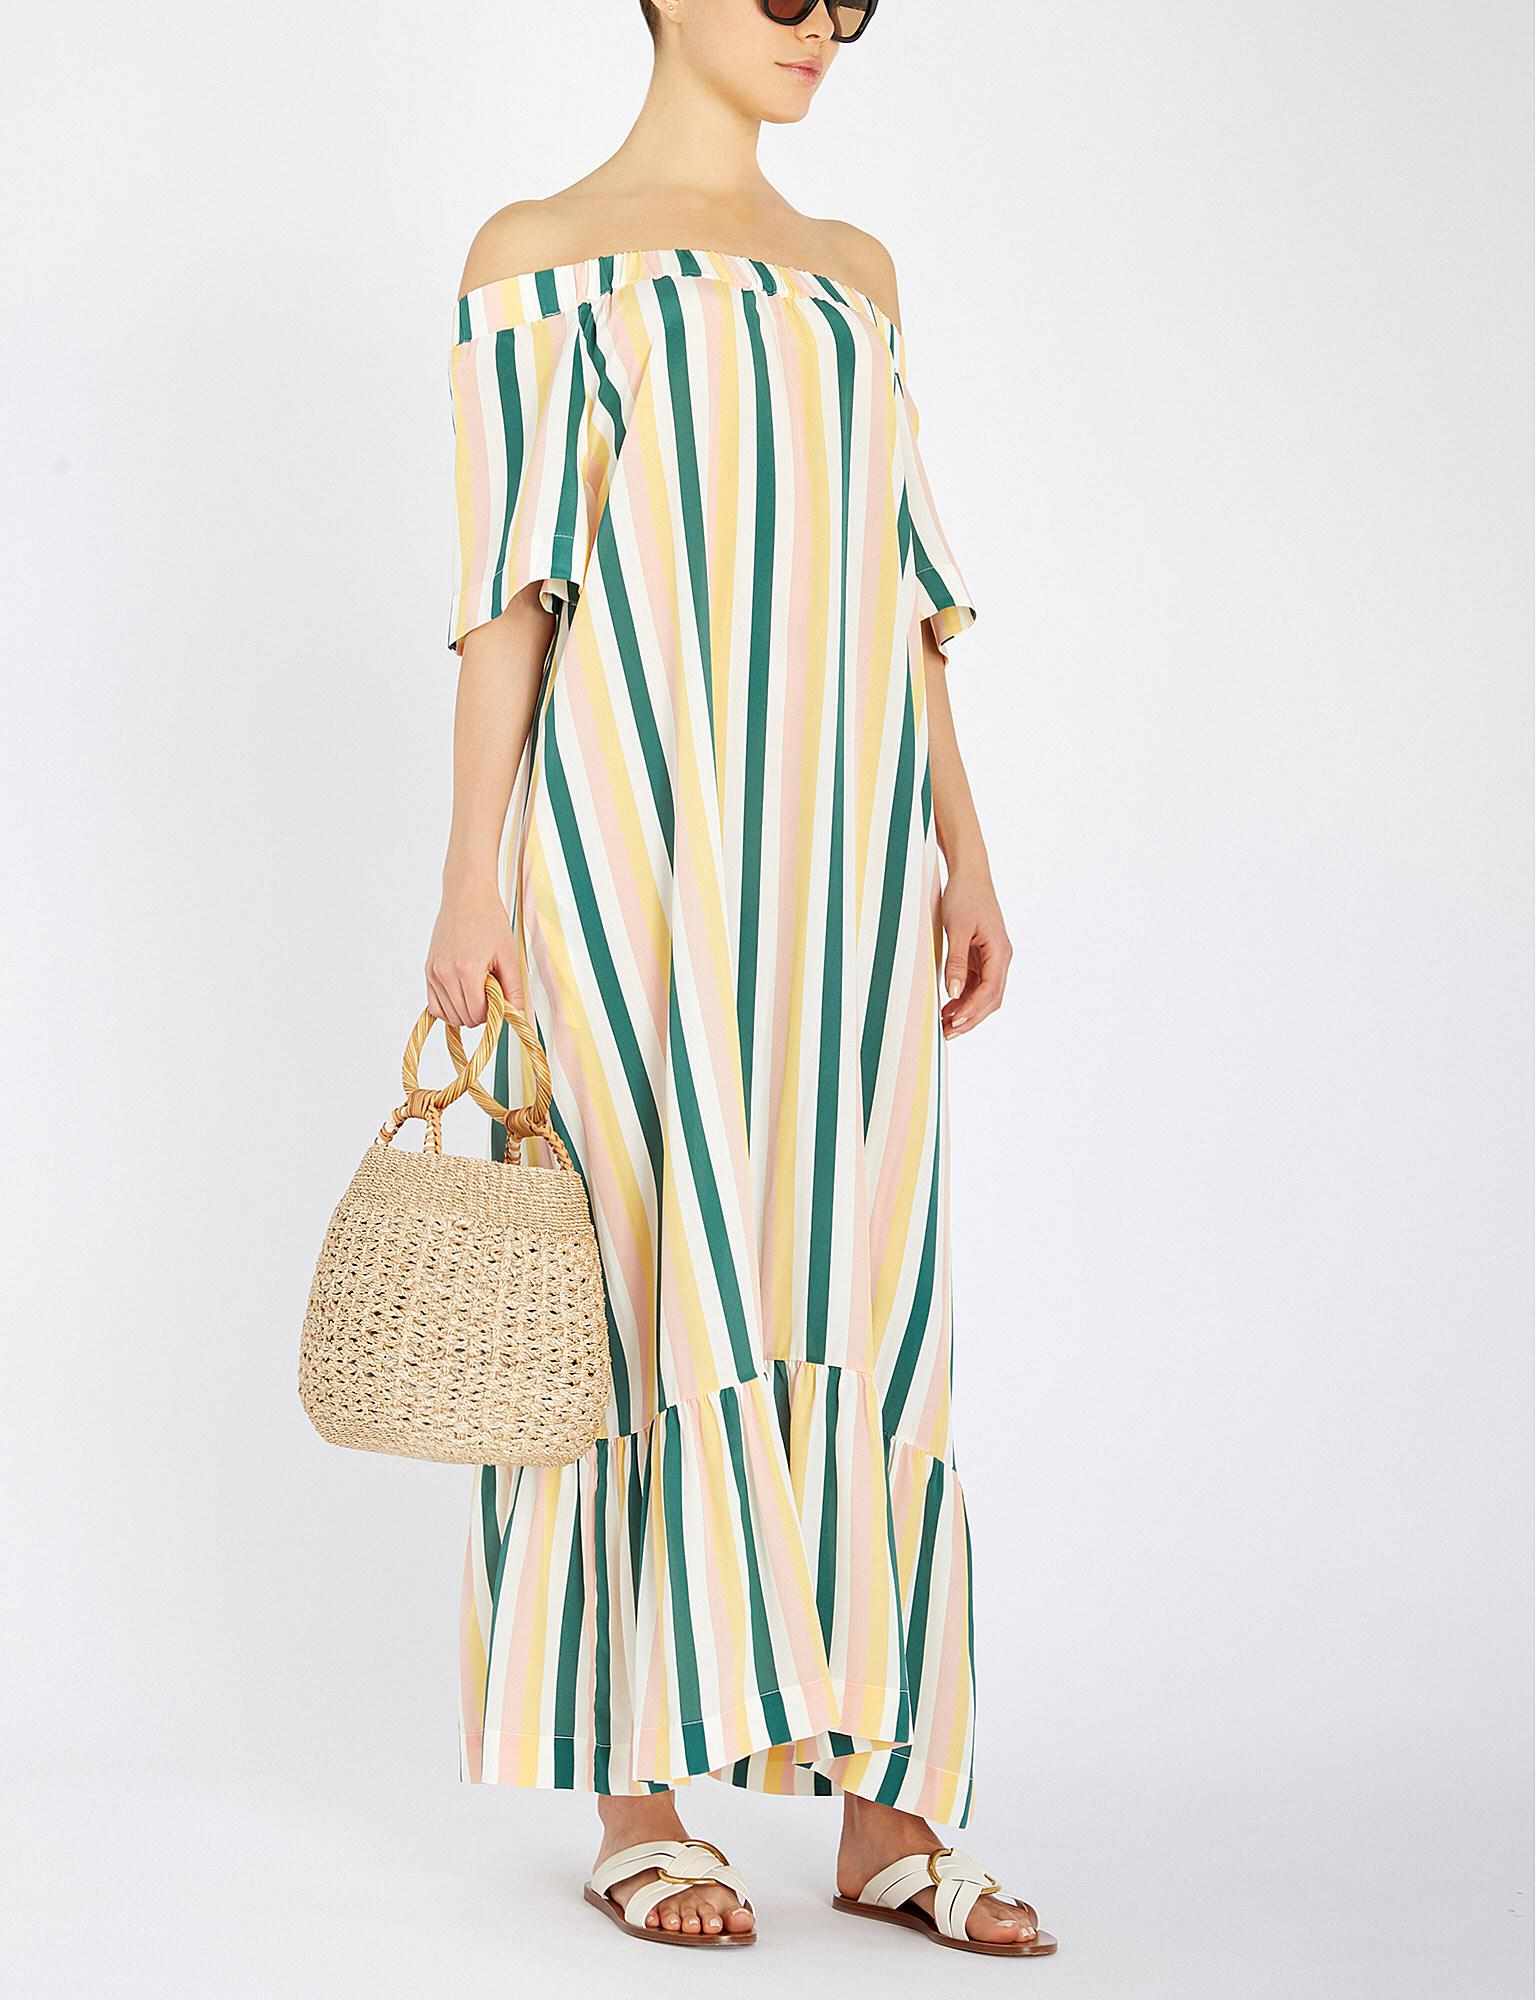 8aa7ec409d49 Lyst - Asceno Striped Off Shoulder Dress - Save 14%